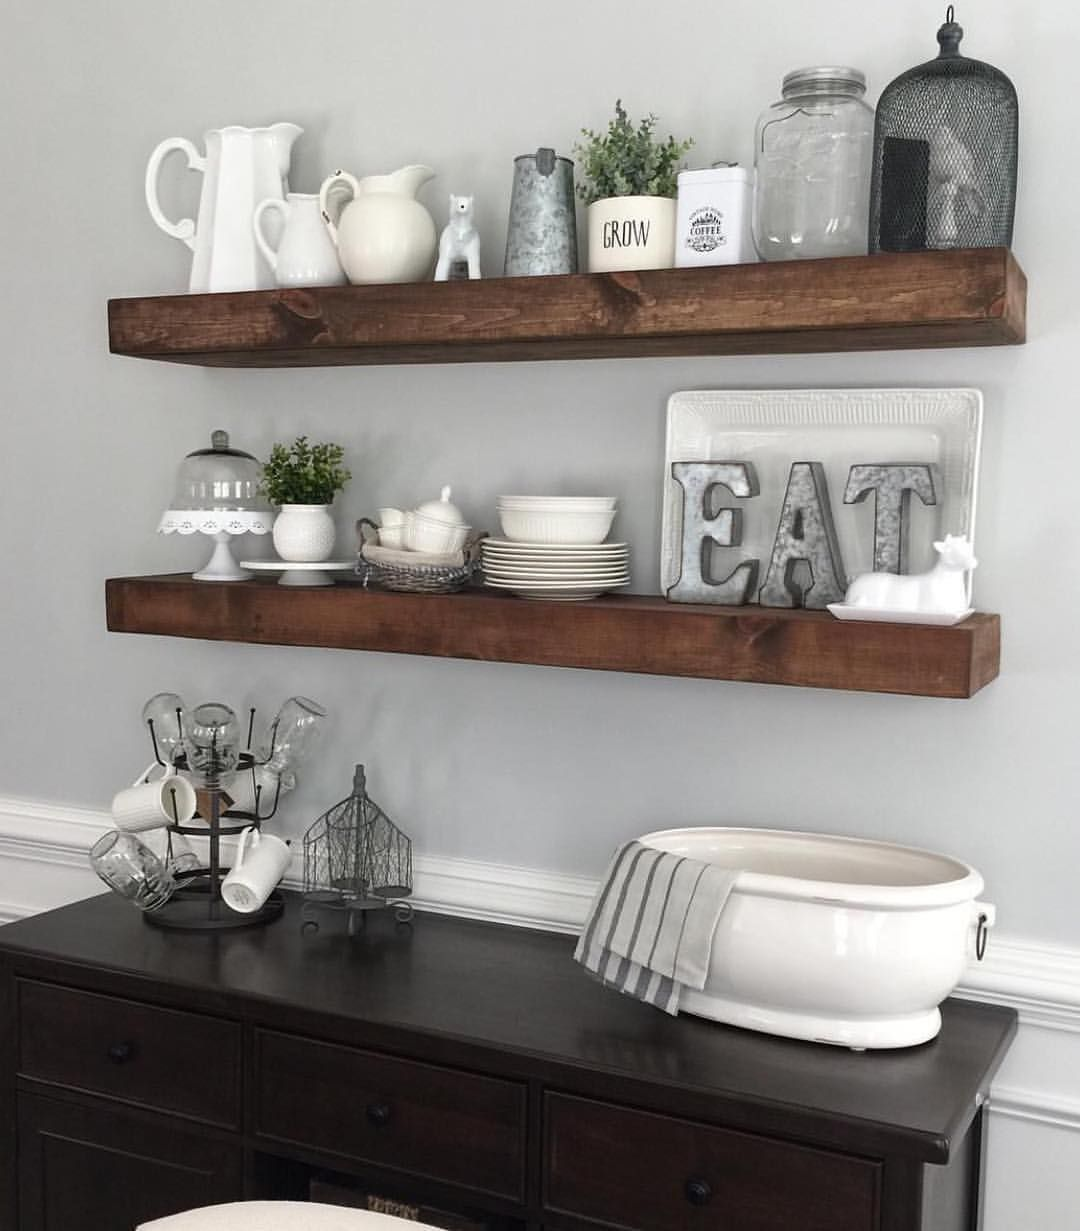 Dining Room Floating Shelves, Wall Shelves Design For Dining Room